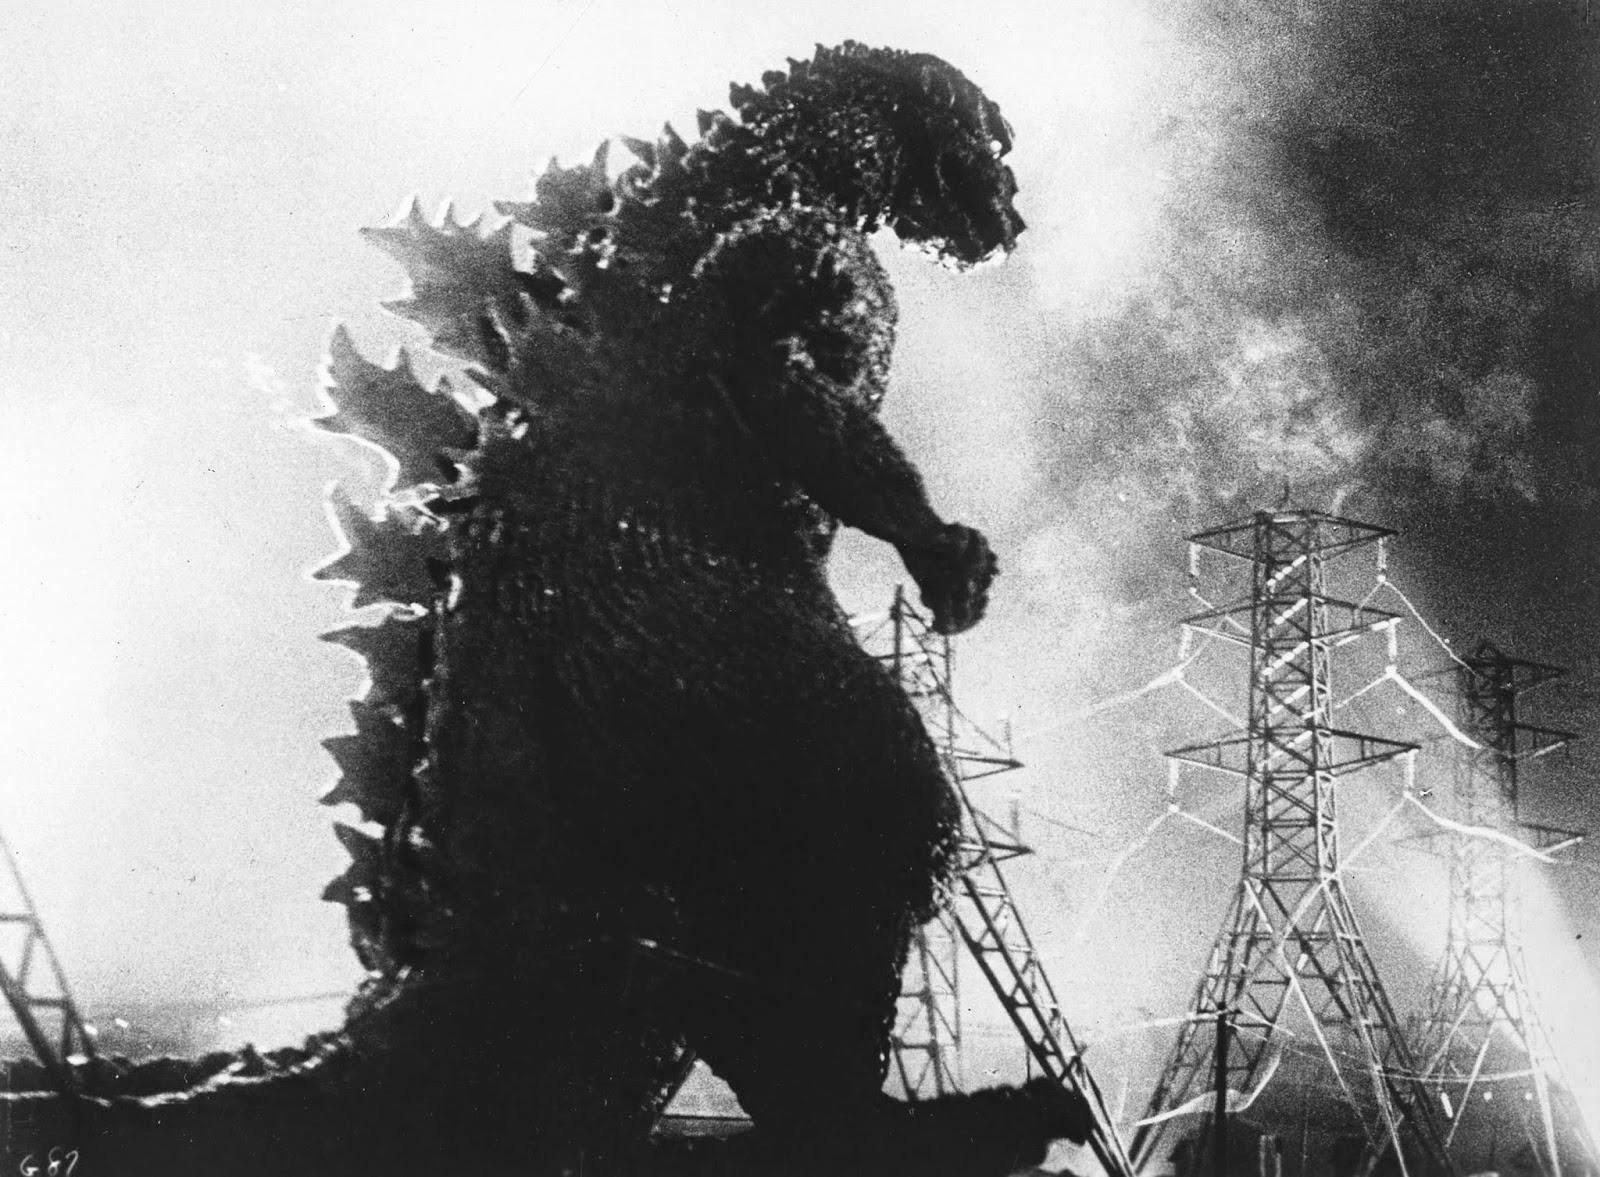 Godzilla majestuoso frente a una central eléctrica